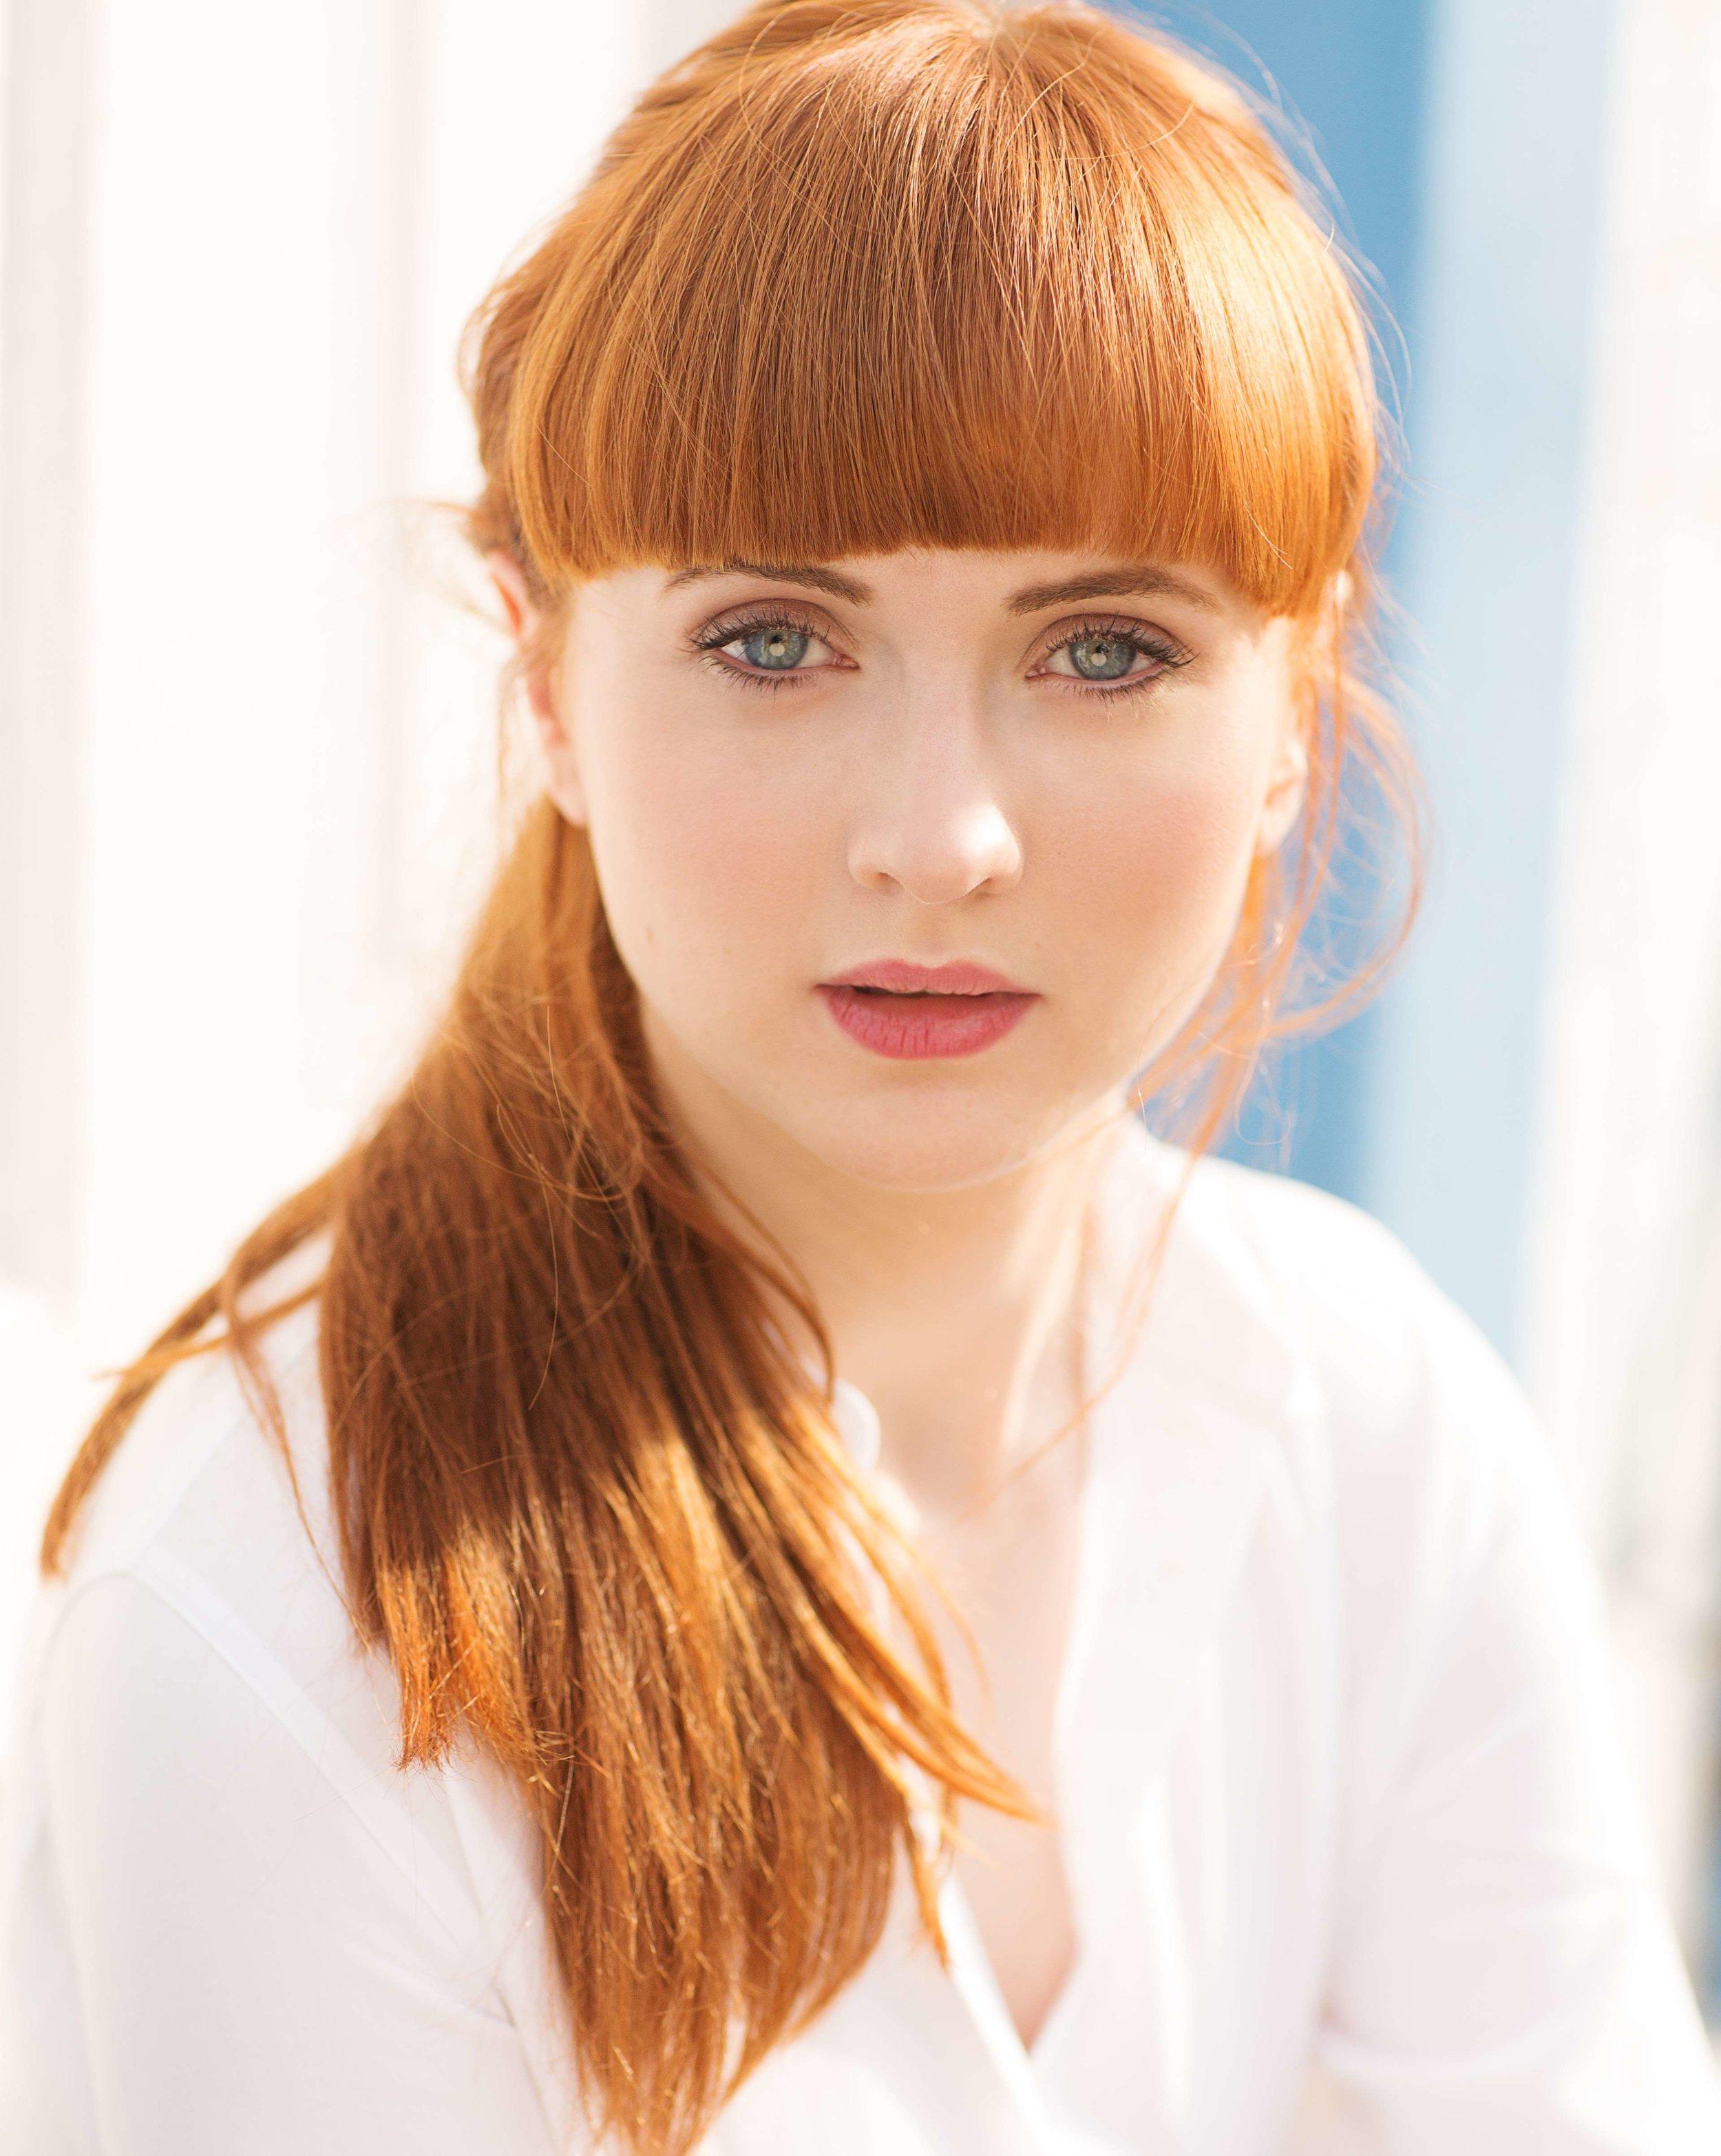 Briony Farrell